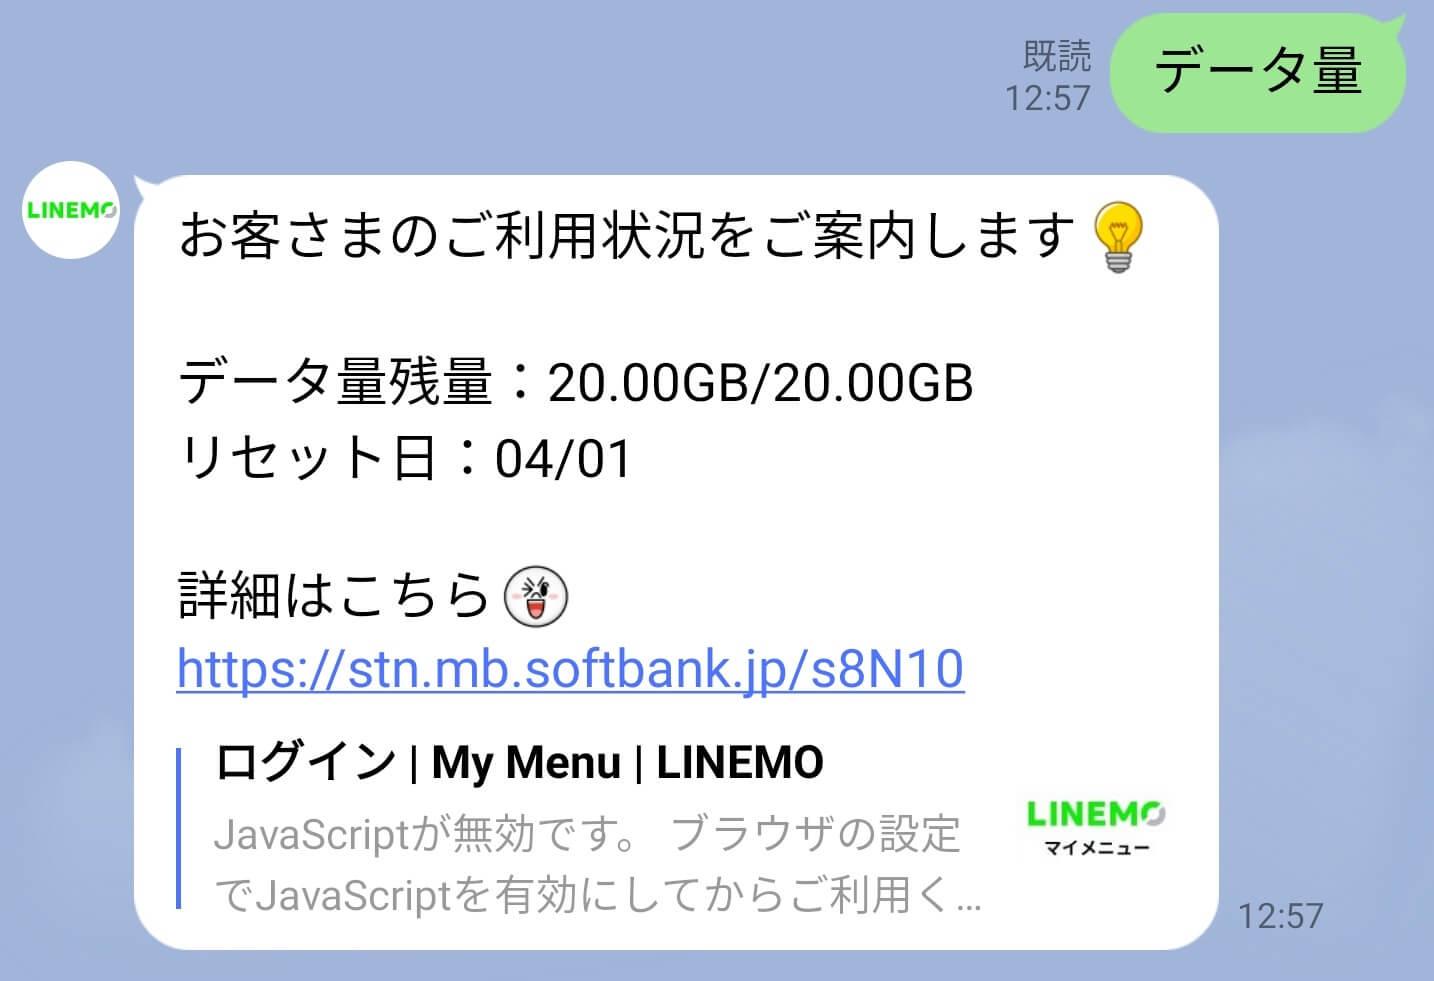 LINEMOのLINEカウントでデータ通信量を確認